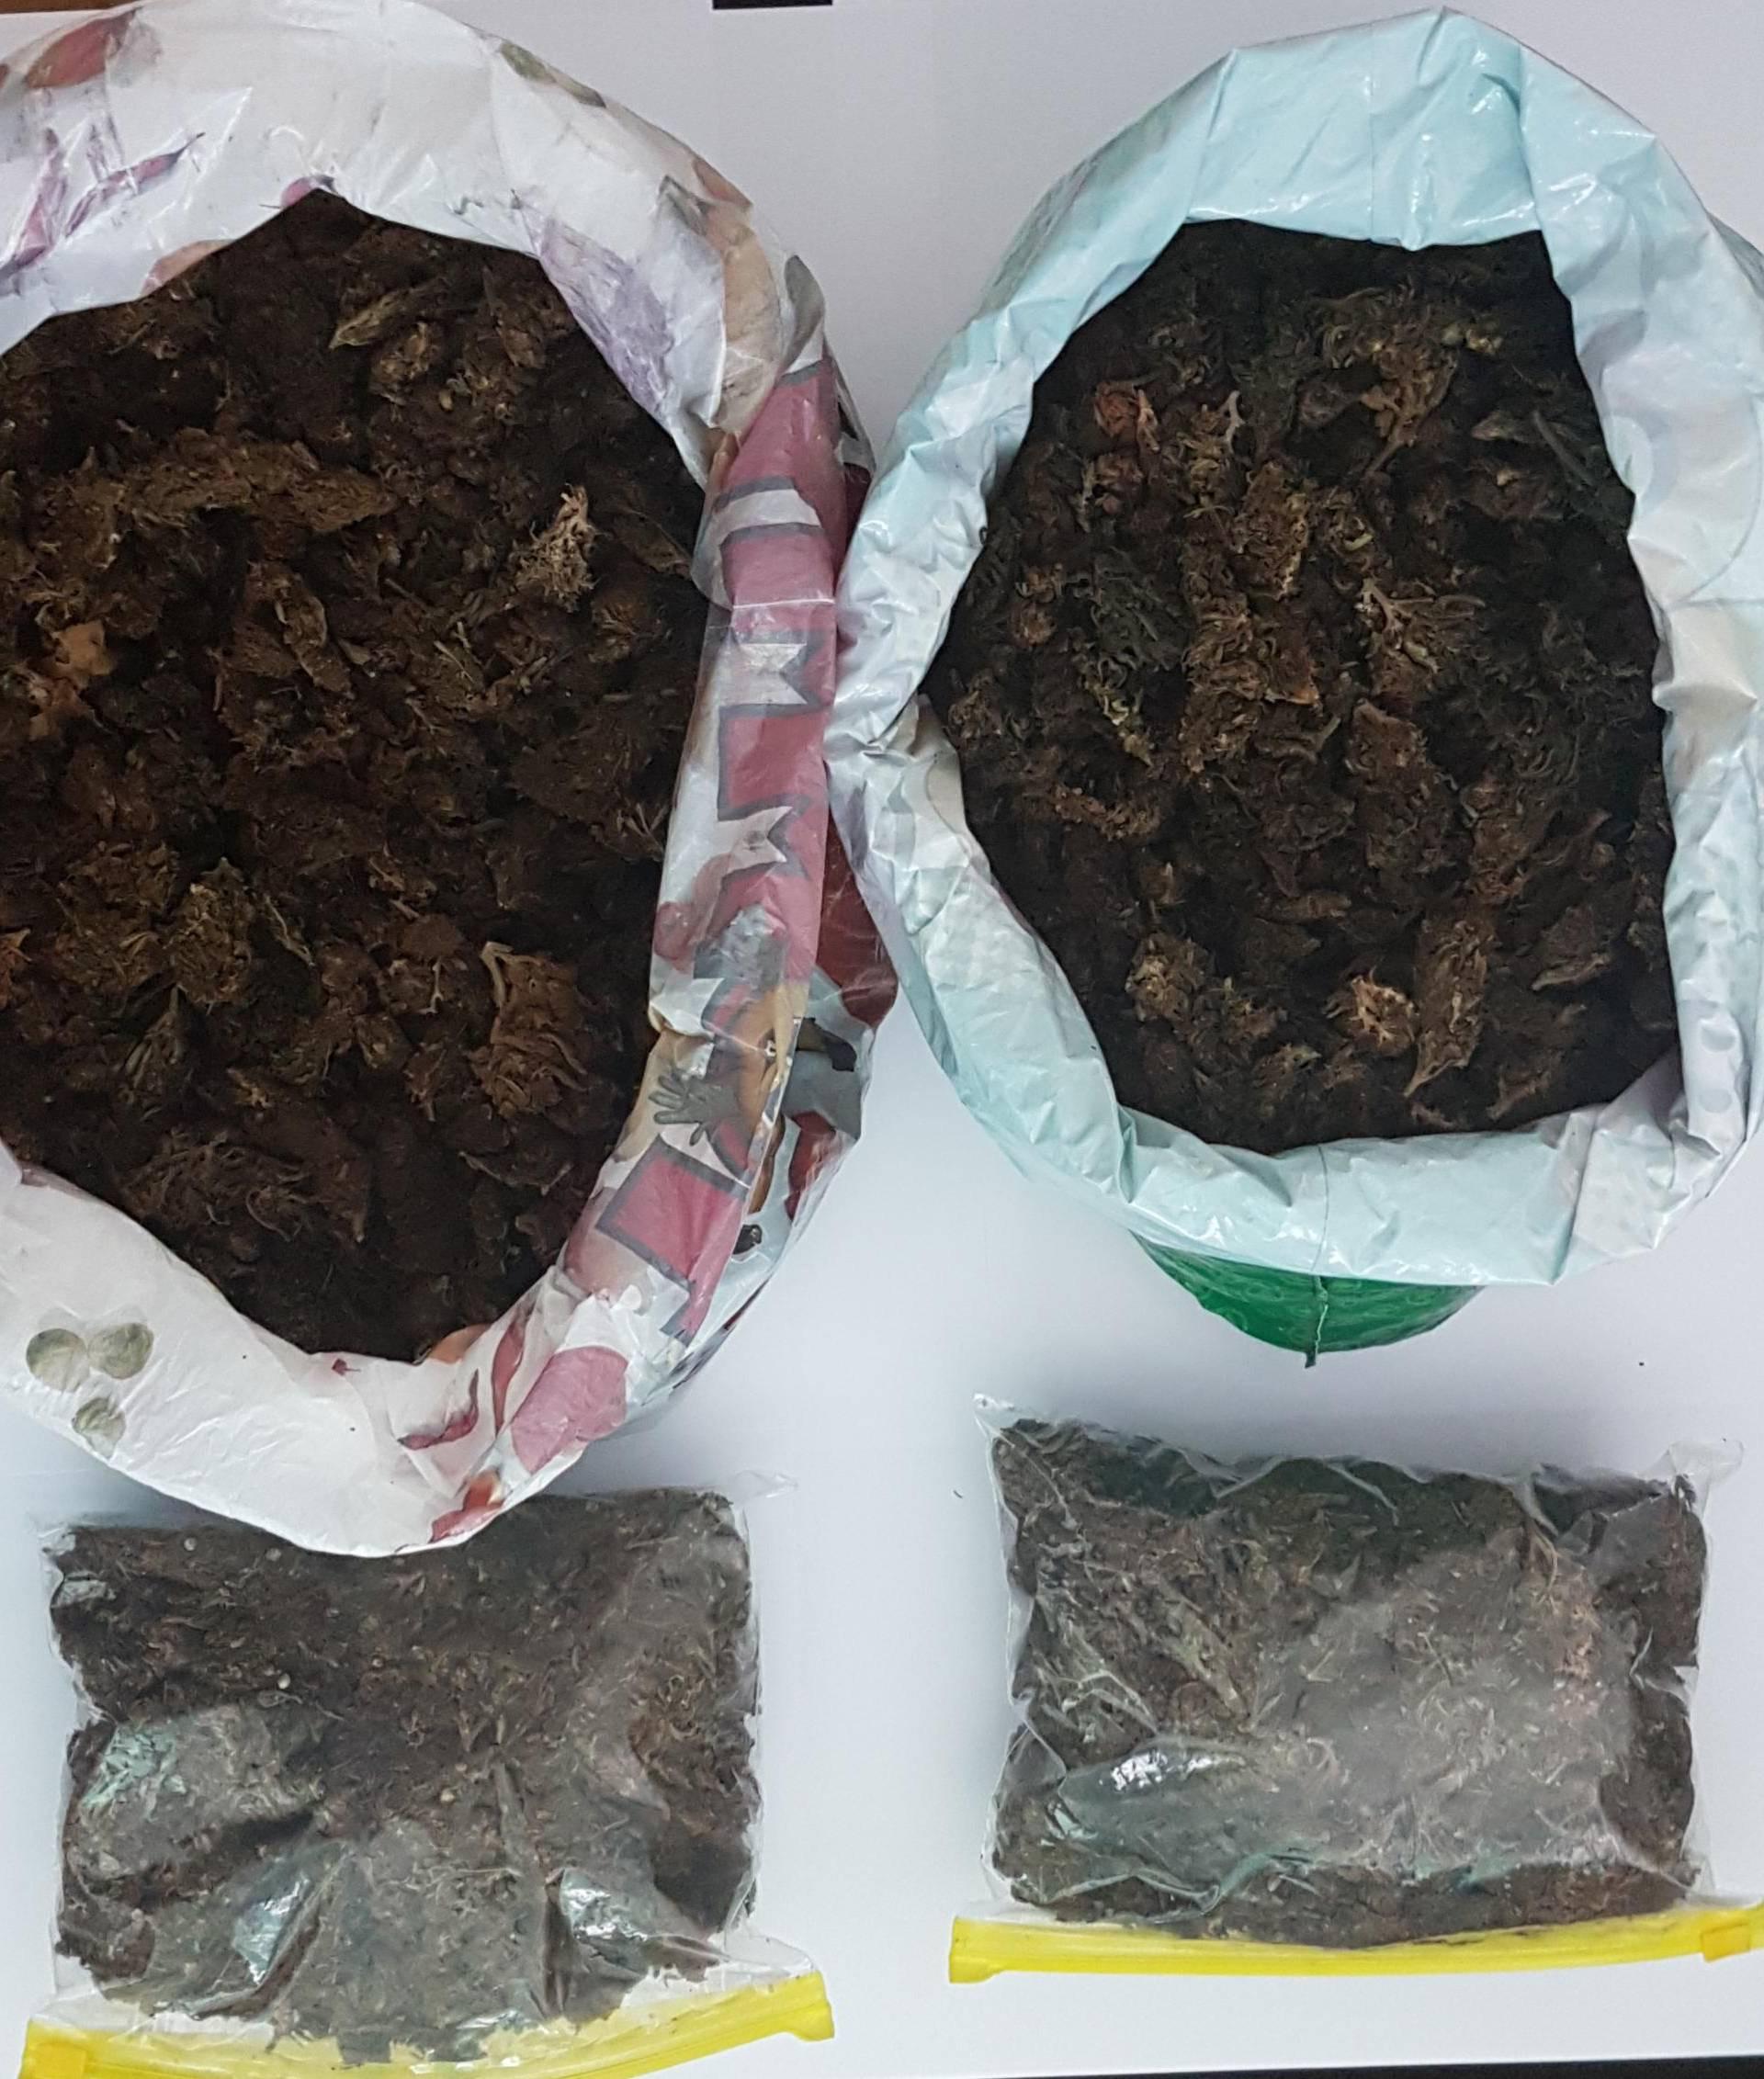 Splitska policija slučajno našla 3,5 kilograma 'trave' u autu